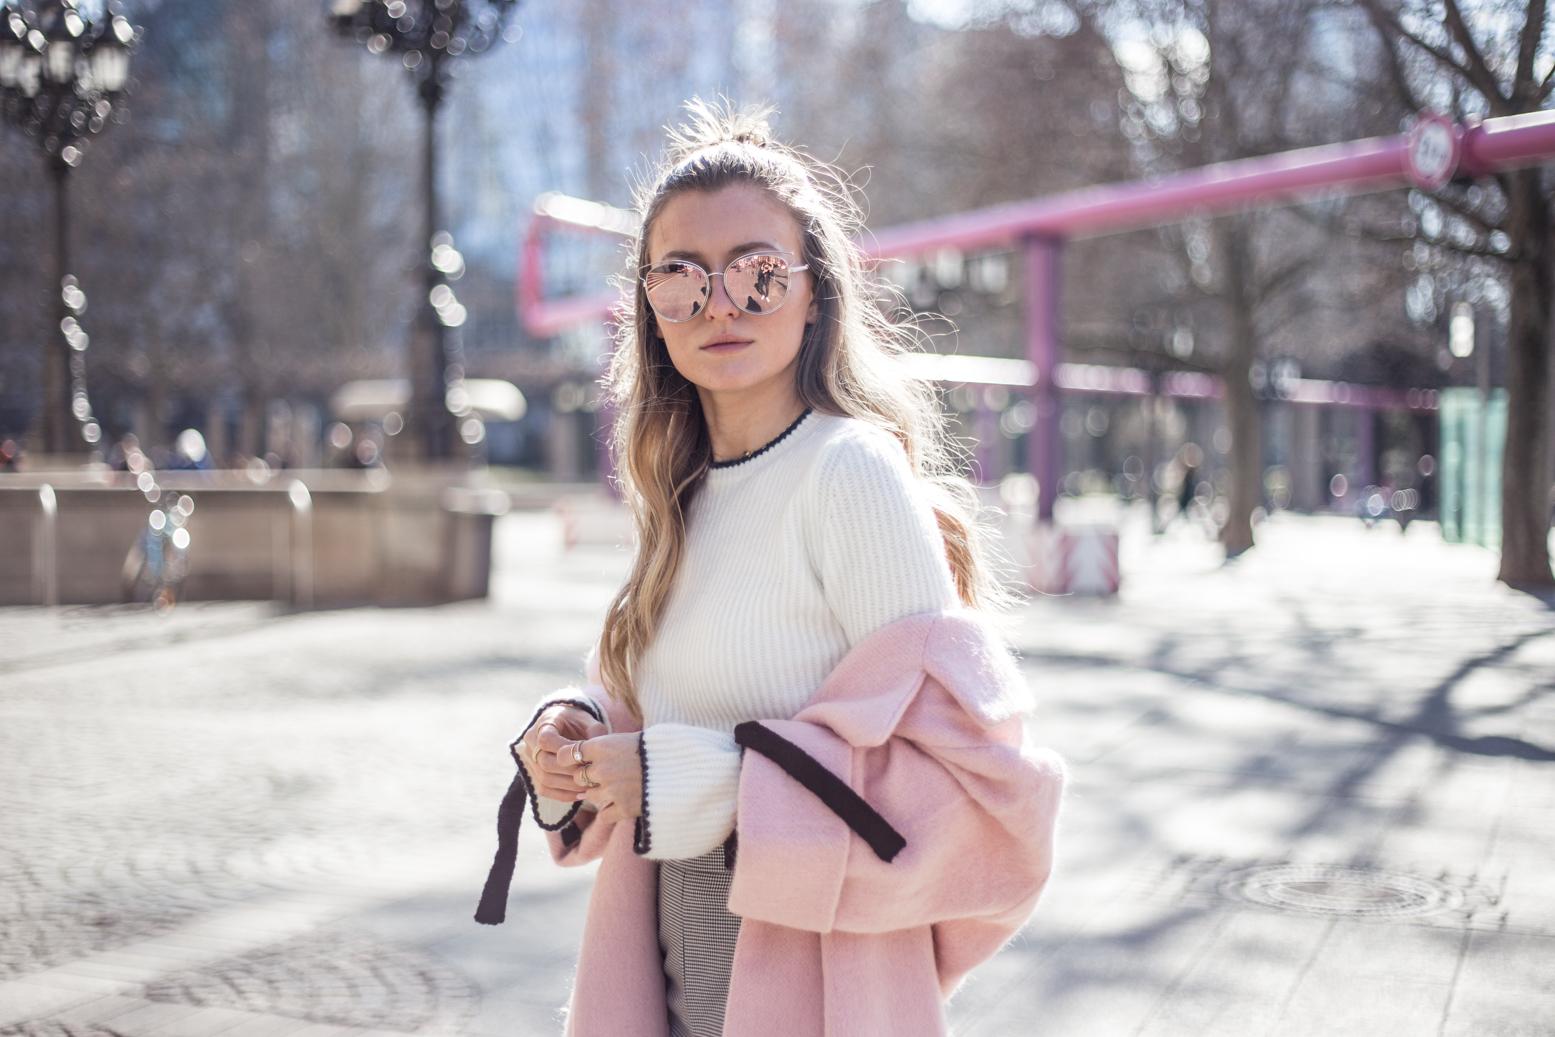 pink-coat-gucci-slipper-livia-auer-1751